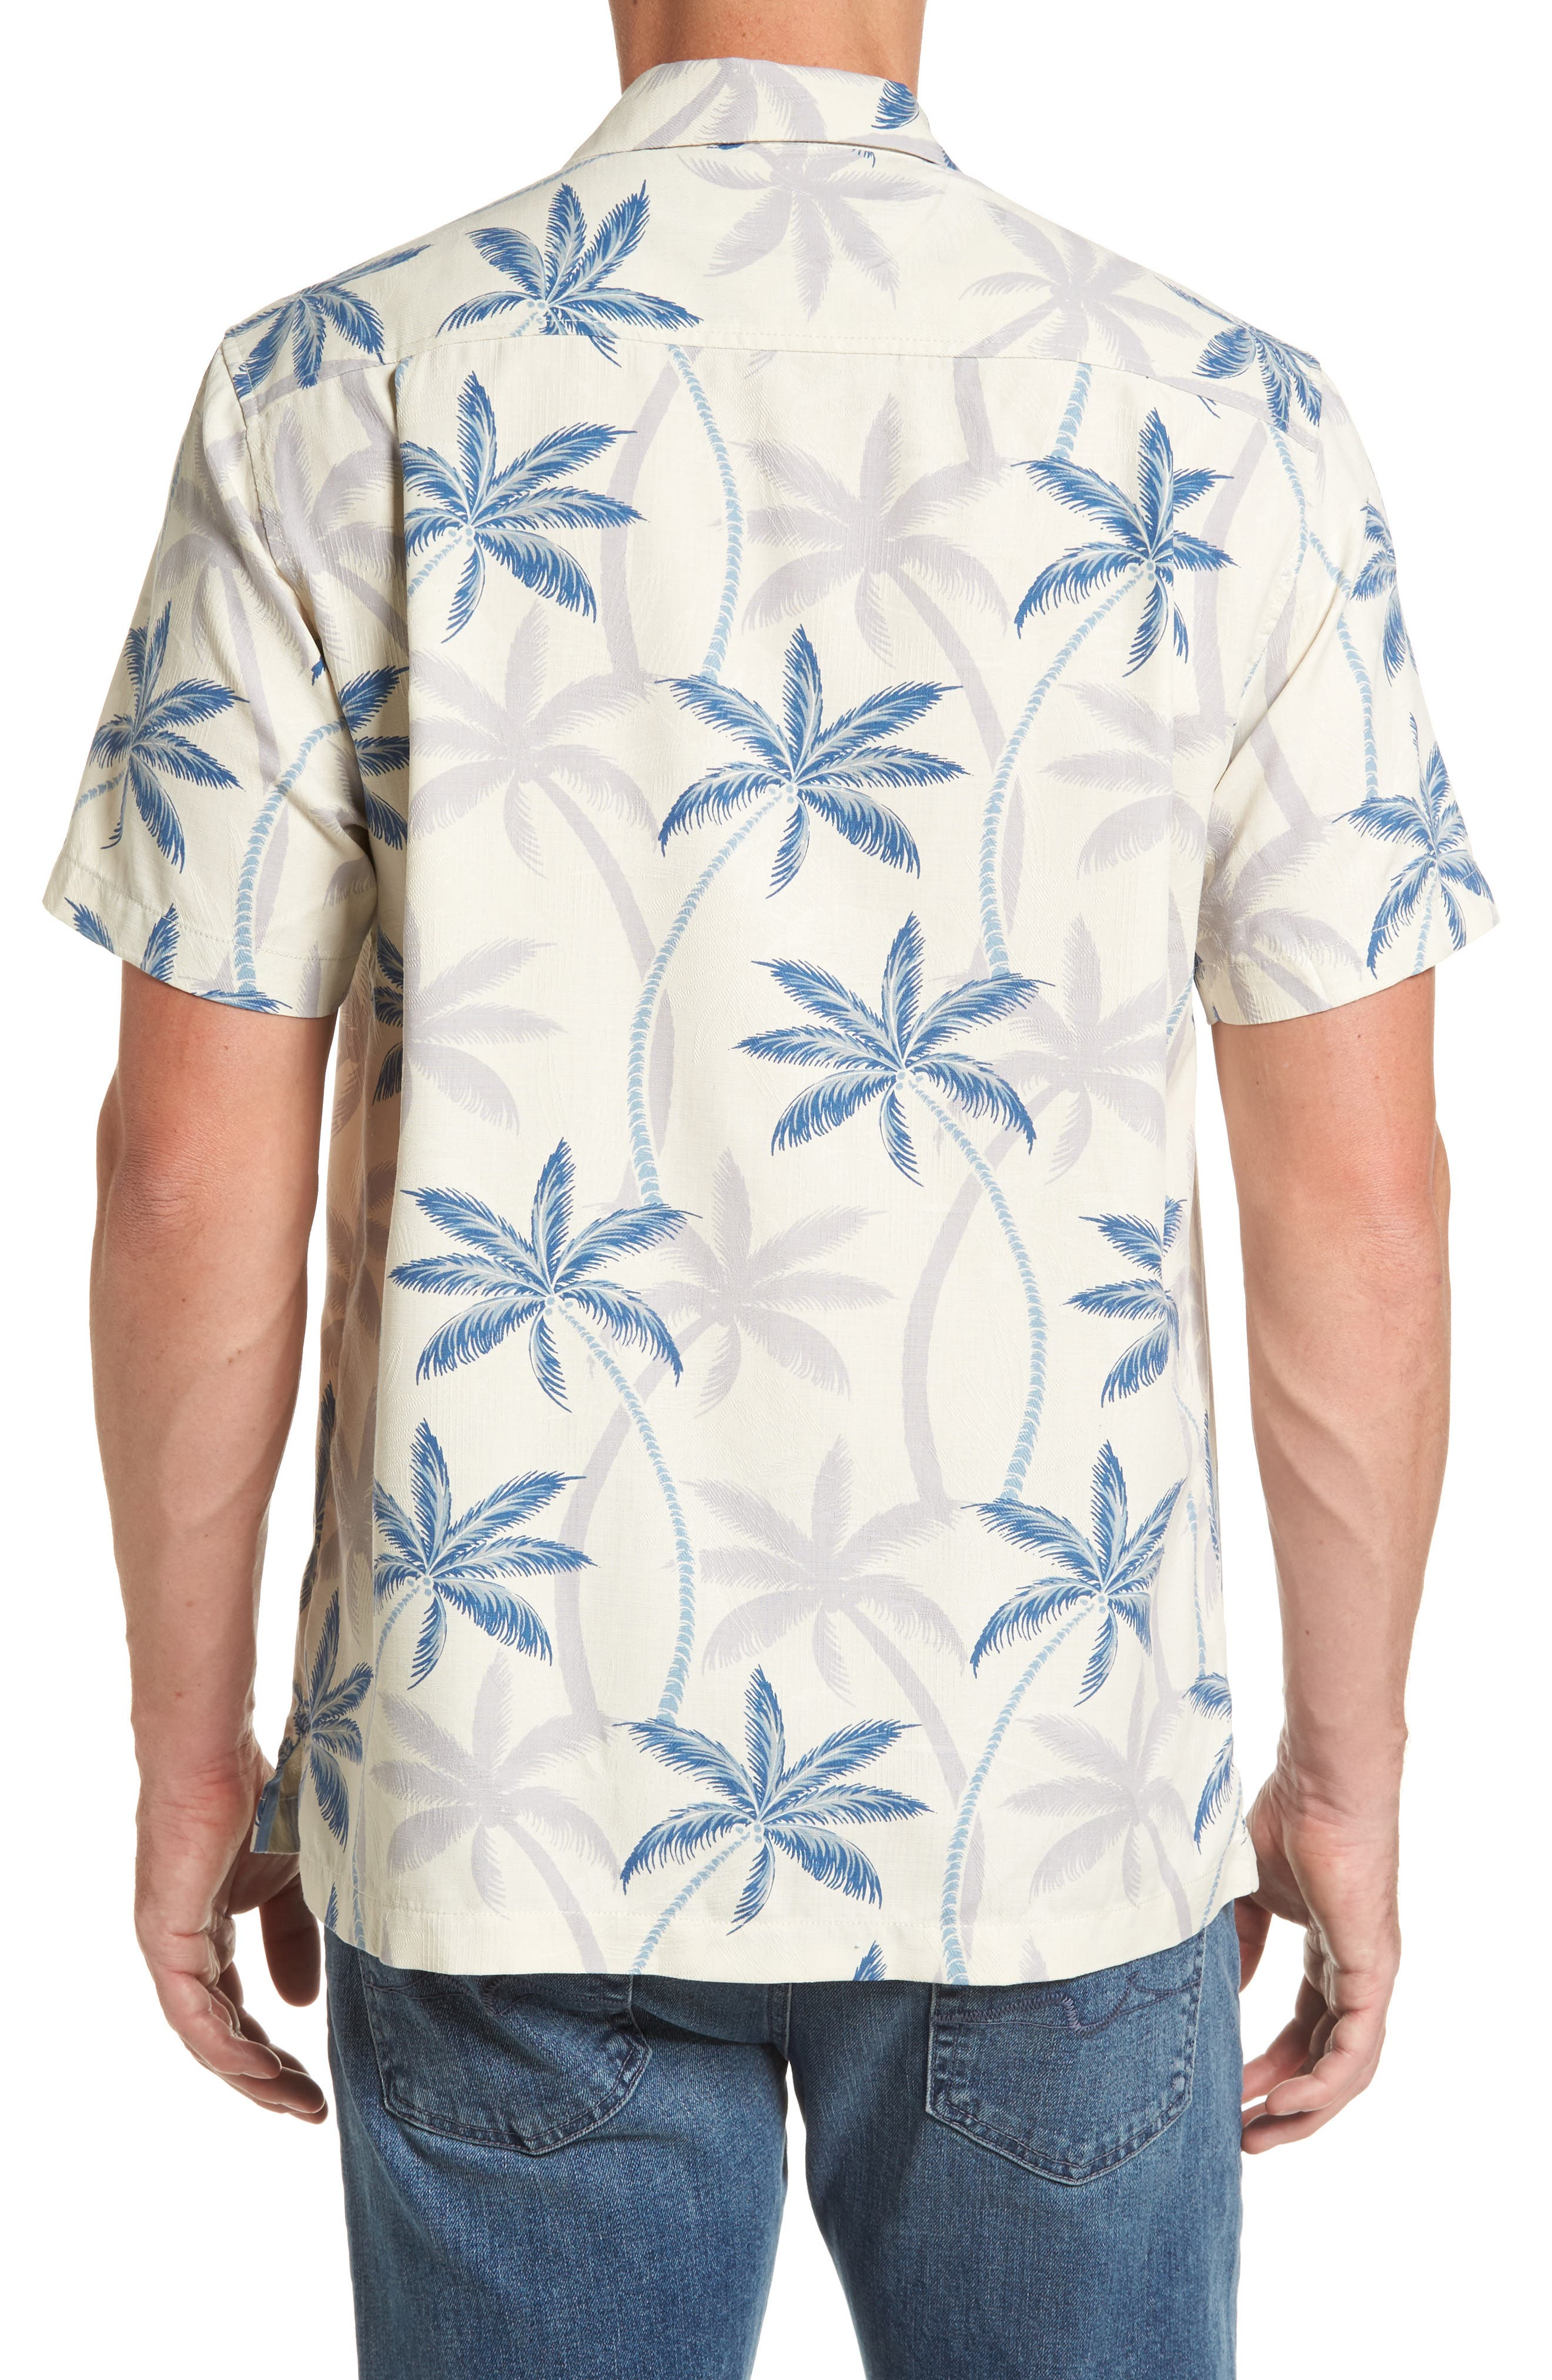 Palmas Palooza Woven Shirt,                             Alternate thumbnail 2, color,                             100